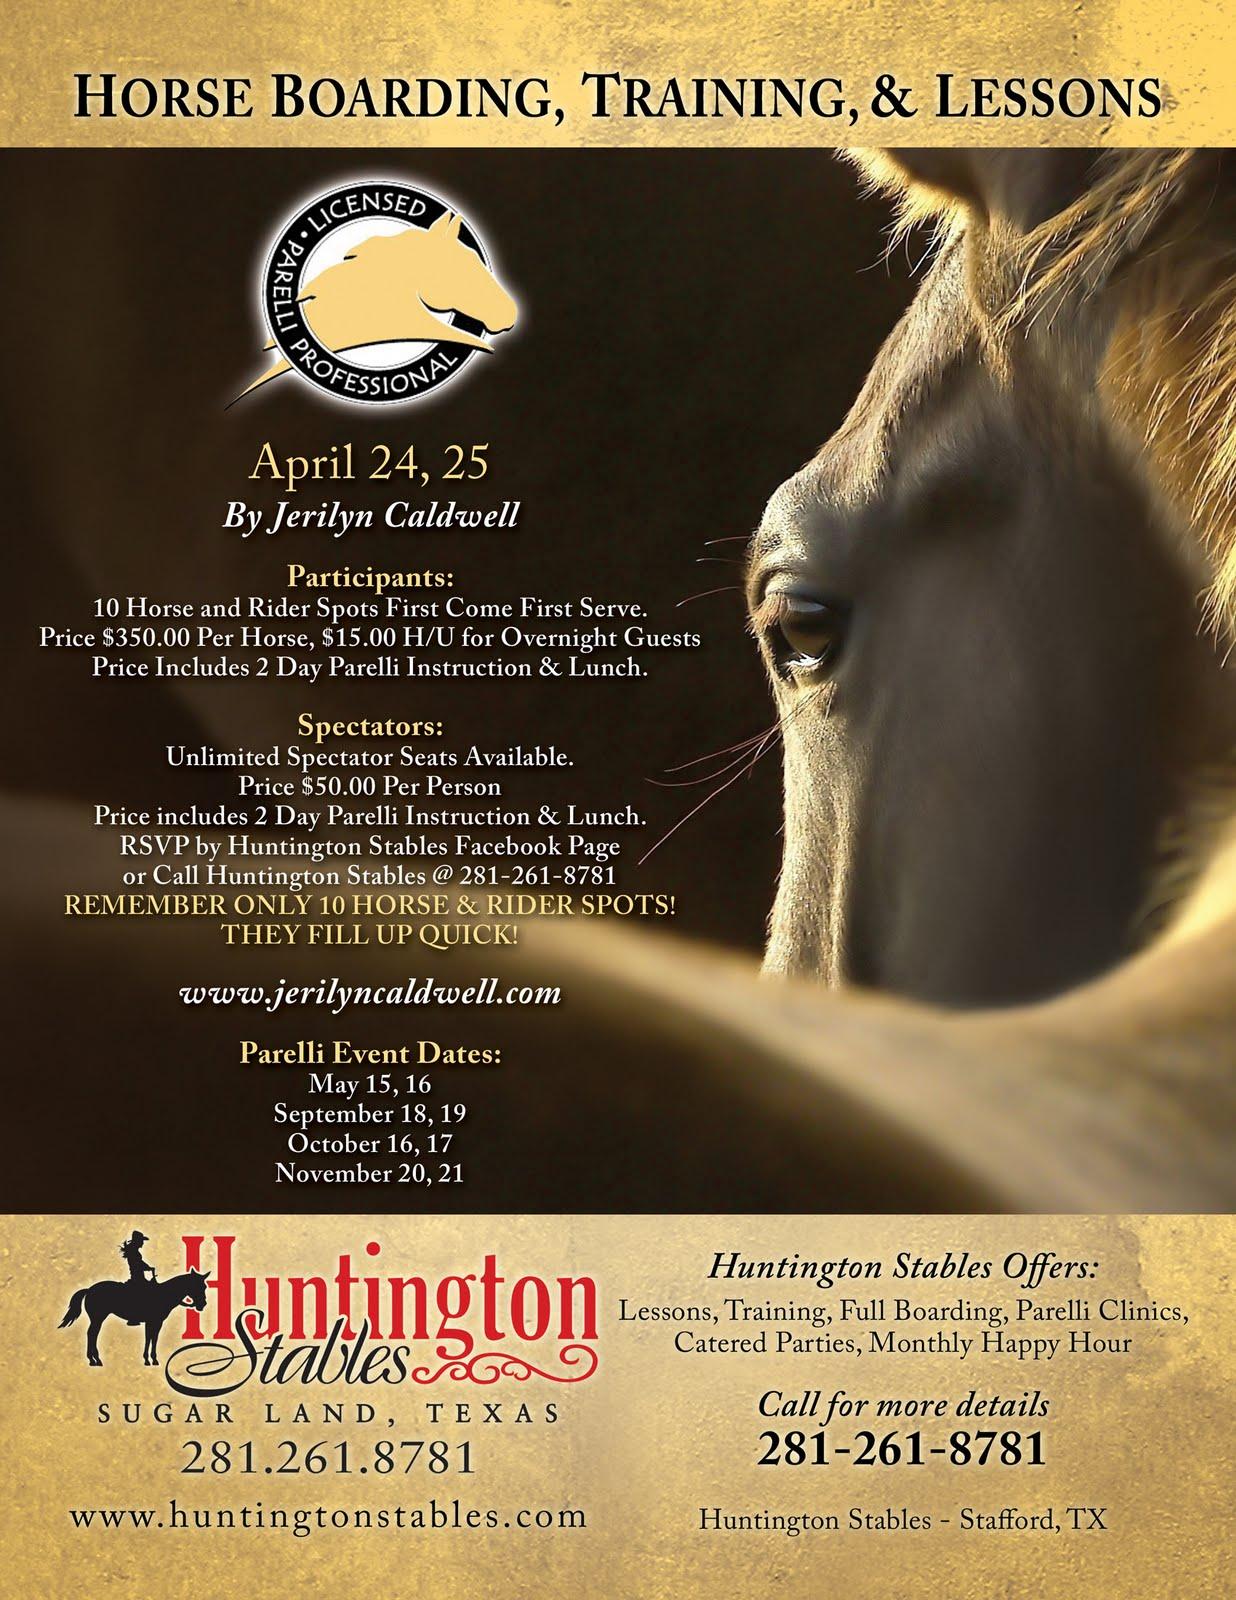 http://3.bp.blogspot.com/_wLOvJDCUxpM/S8N4N2Oy6fI/AAAAAAAAABk/5lbeRiMD5Sk/s1600/Horseback+ad+april.jpg